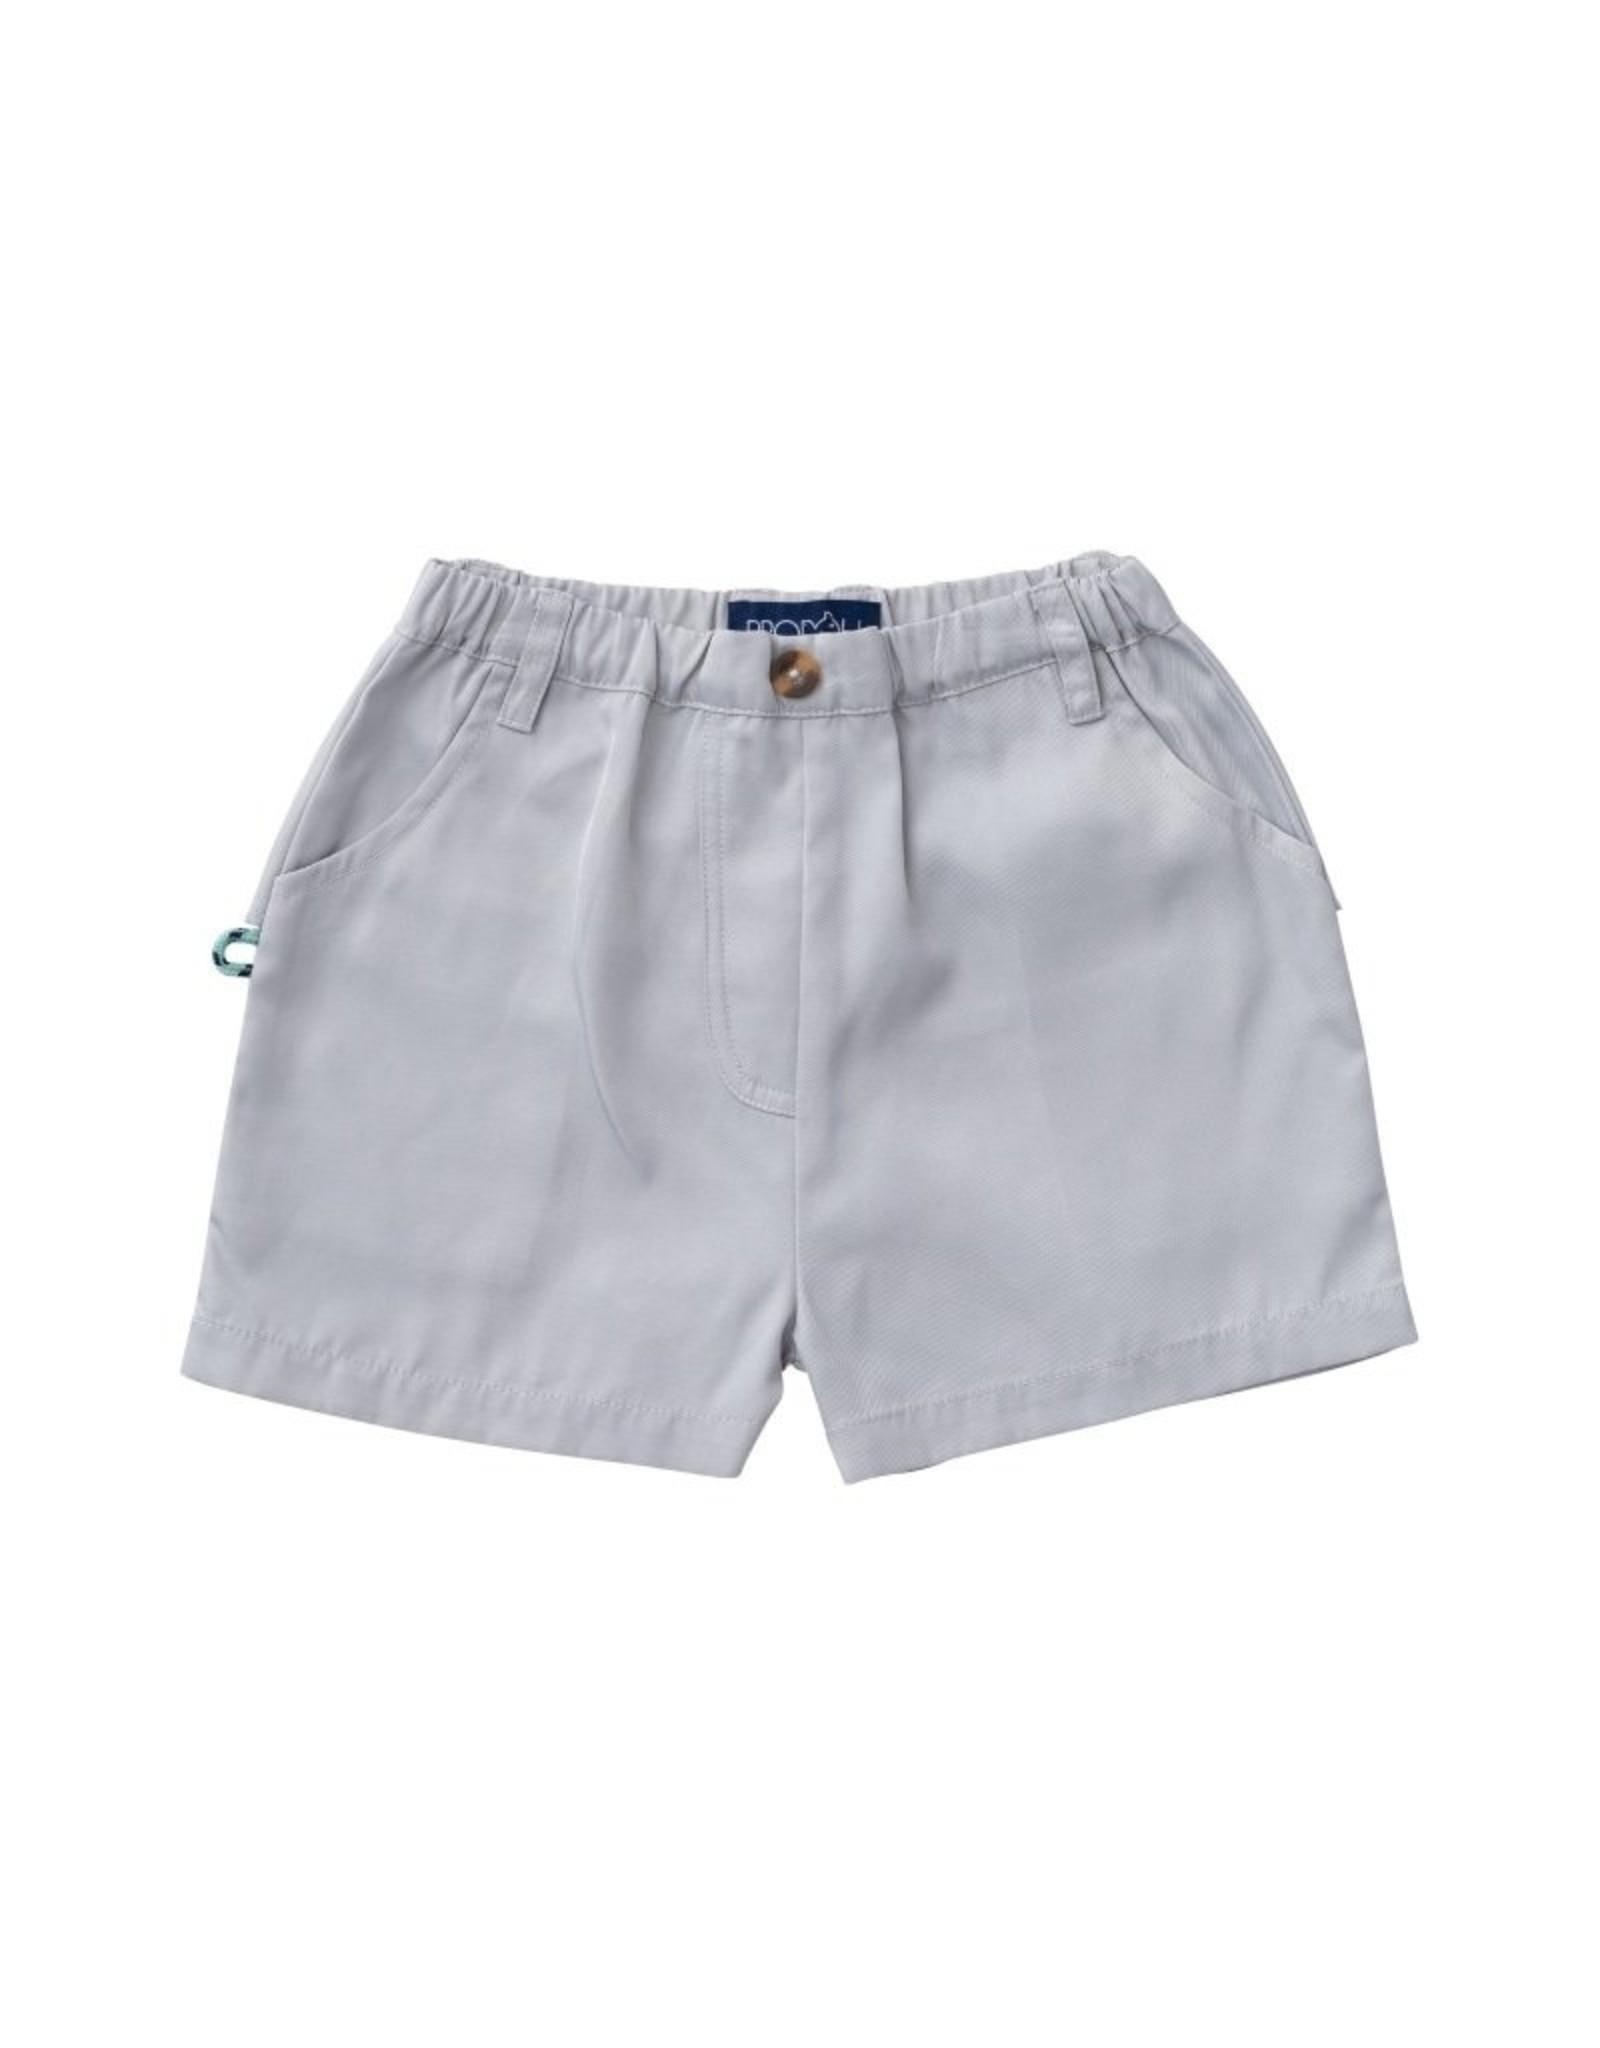 Prodoh Gray Angler Fishing Shorts